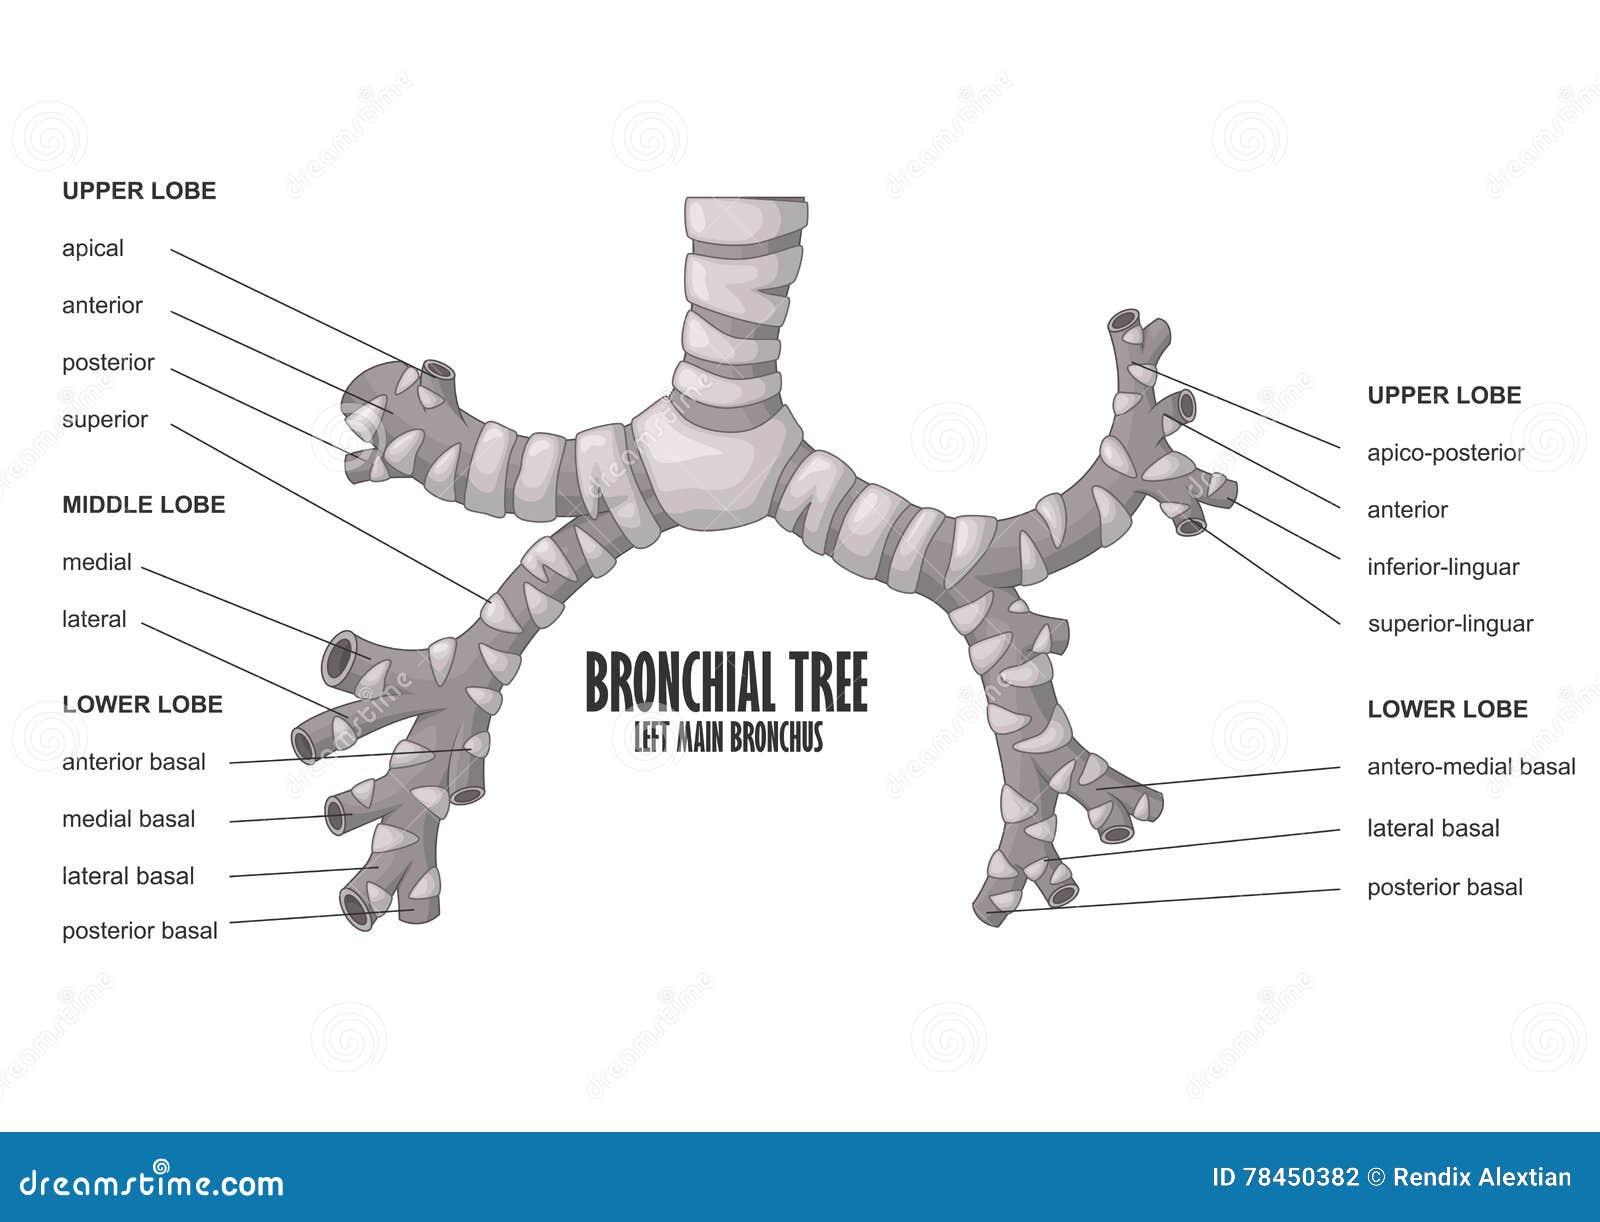 Bronchial Tree Left Main Bronchus Human Anatomy Stock Vector ...